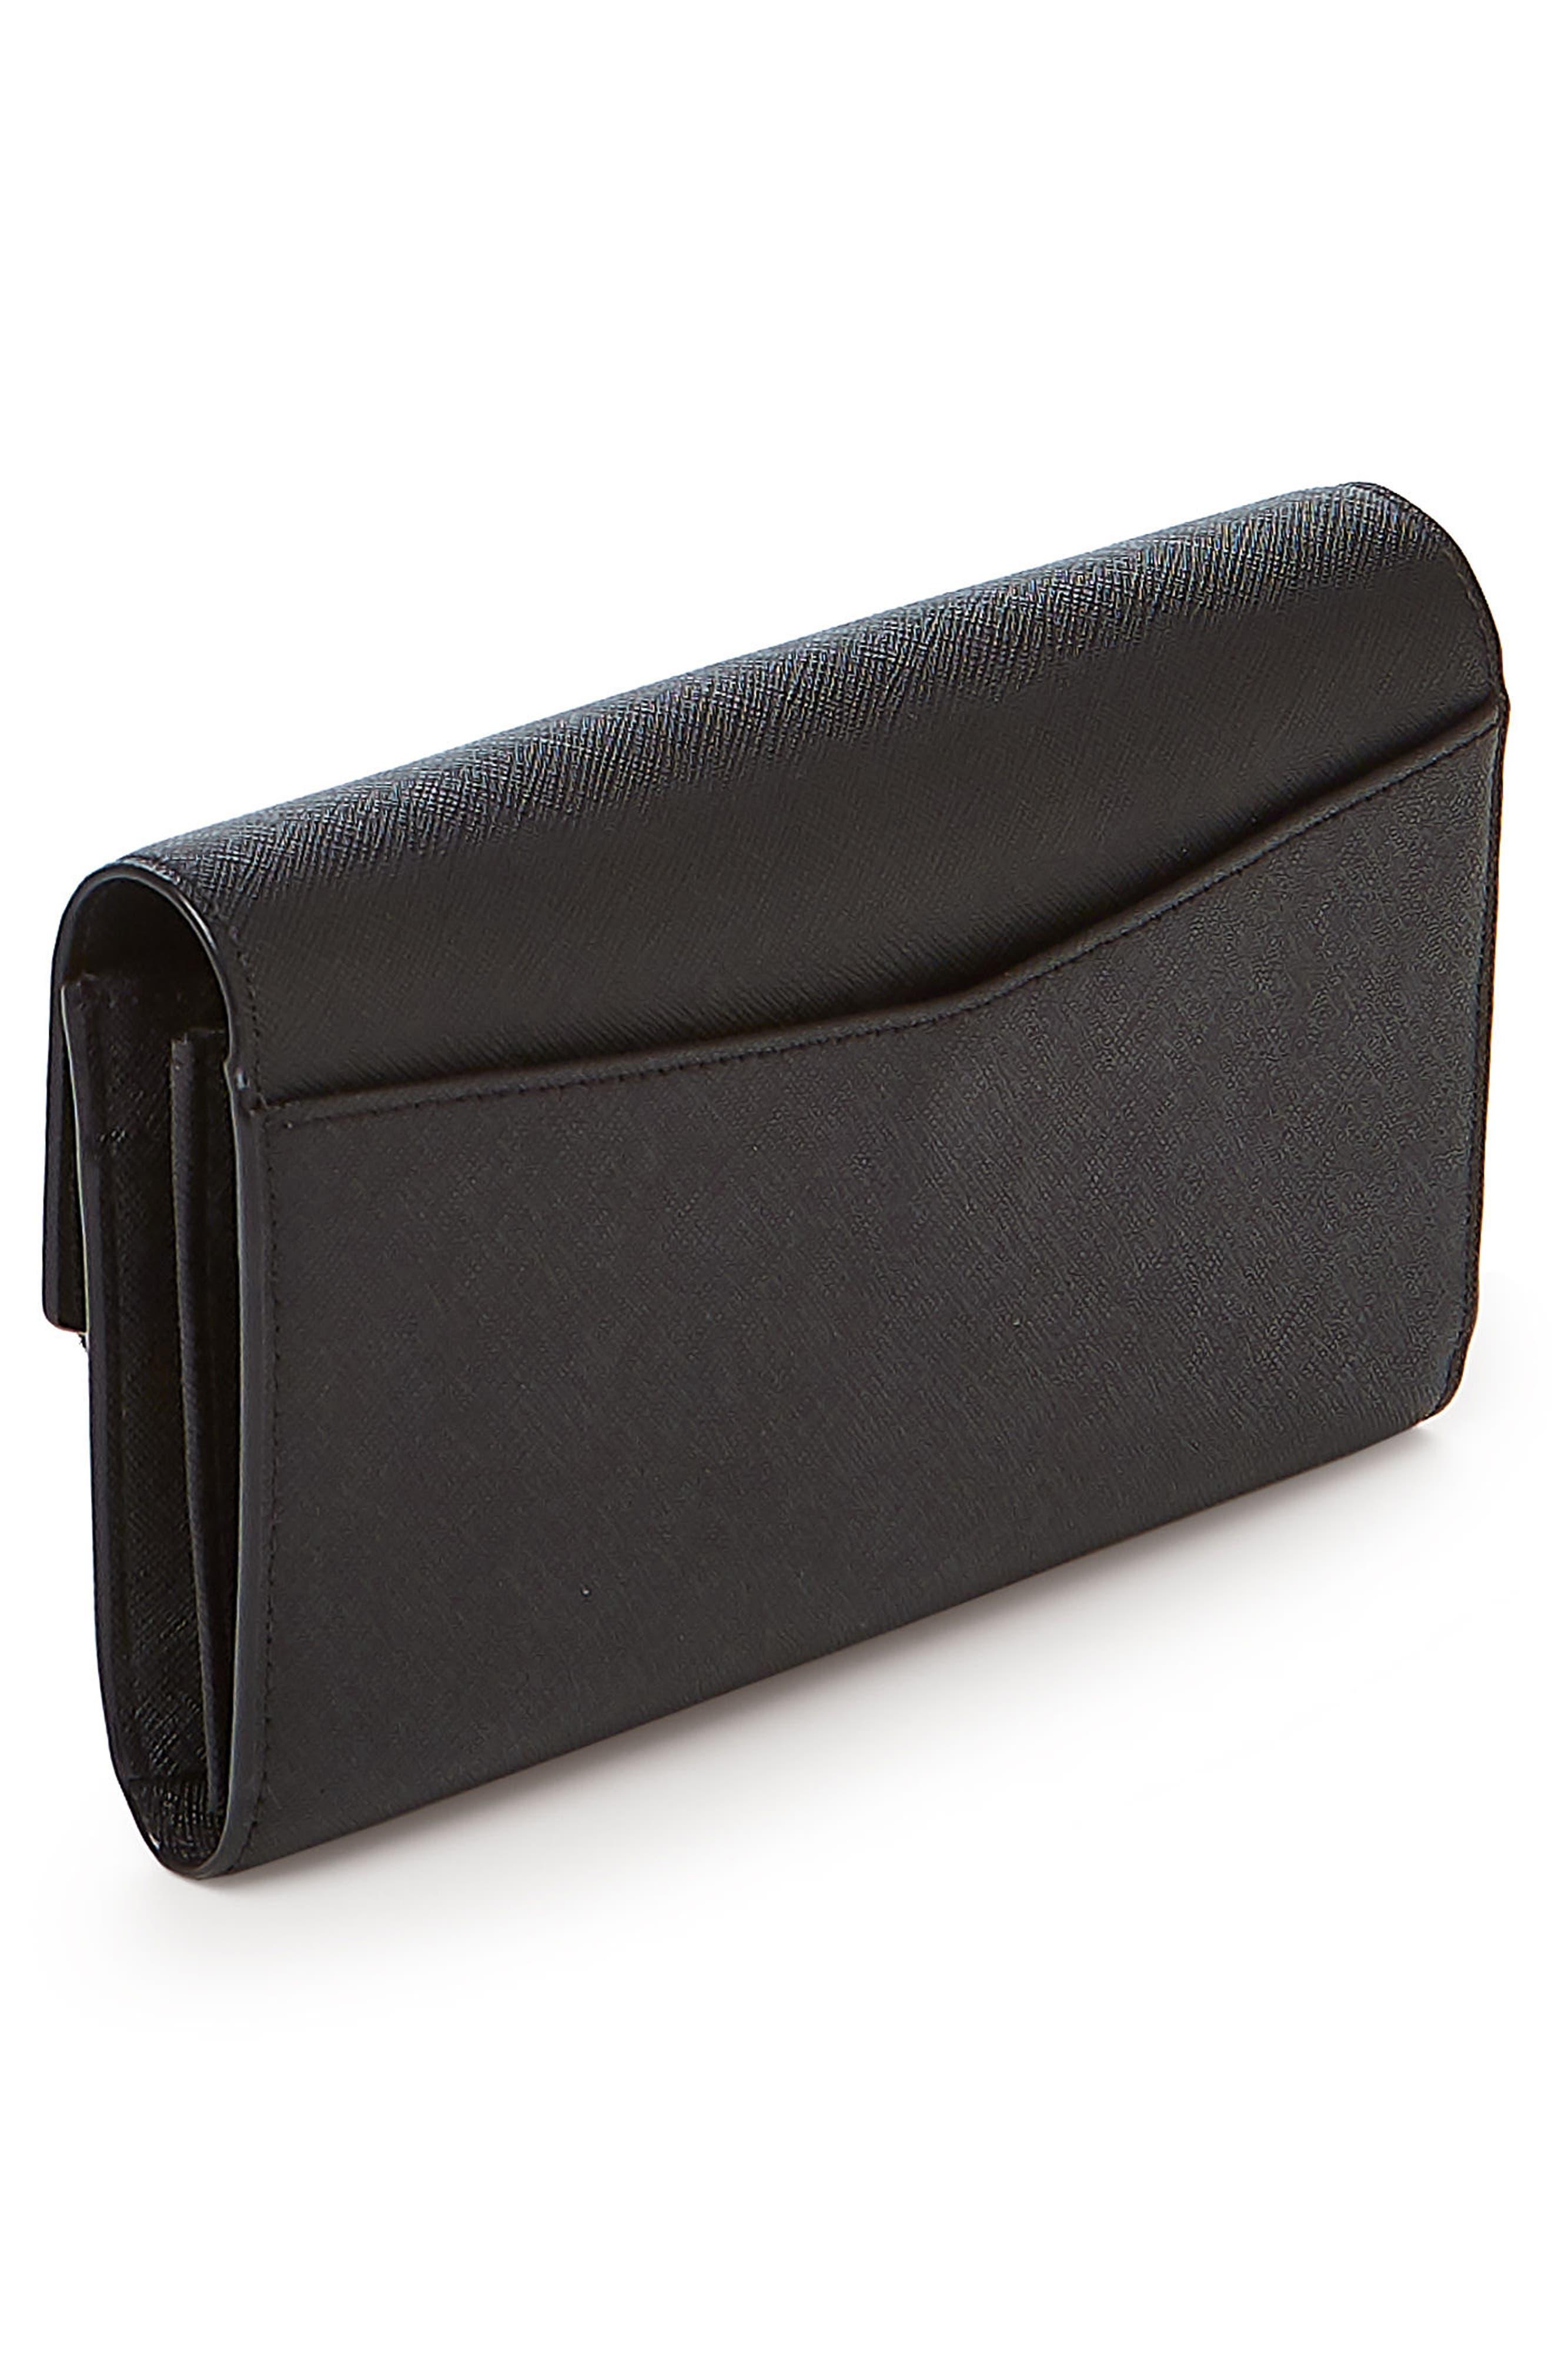 Cobble Hill Calfskin Leather Wallet,                             Alternate thumbnail 3, color,                             Black